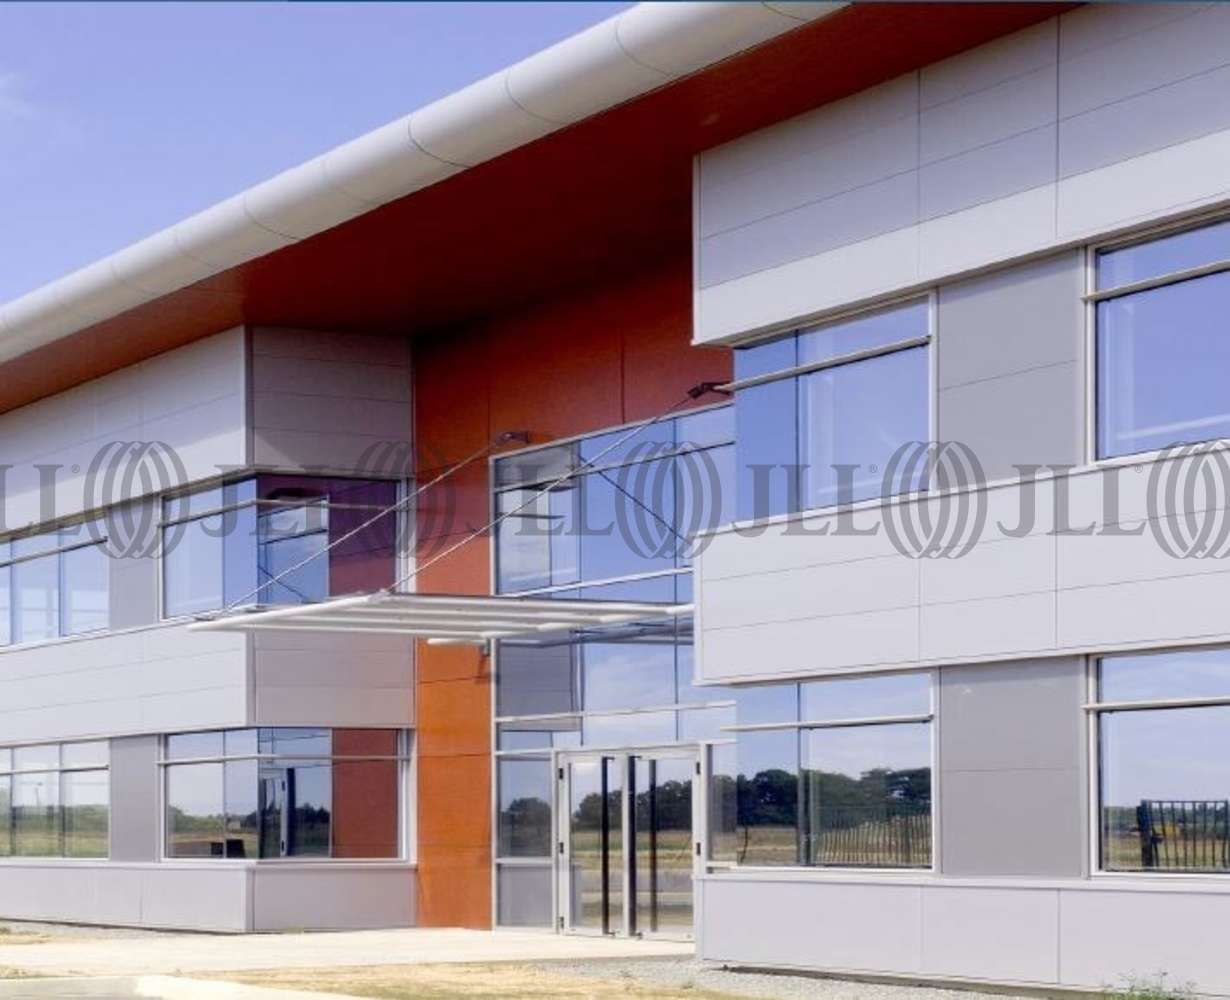 Activités/entrepôt Lieusaint, 77127 - PERIPARK BATIMENT 1 - 9445540